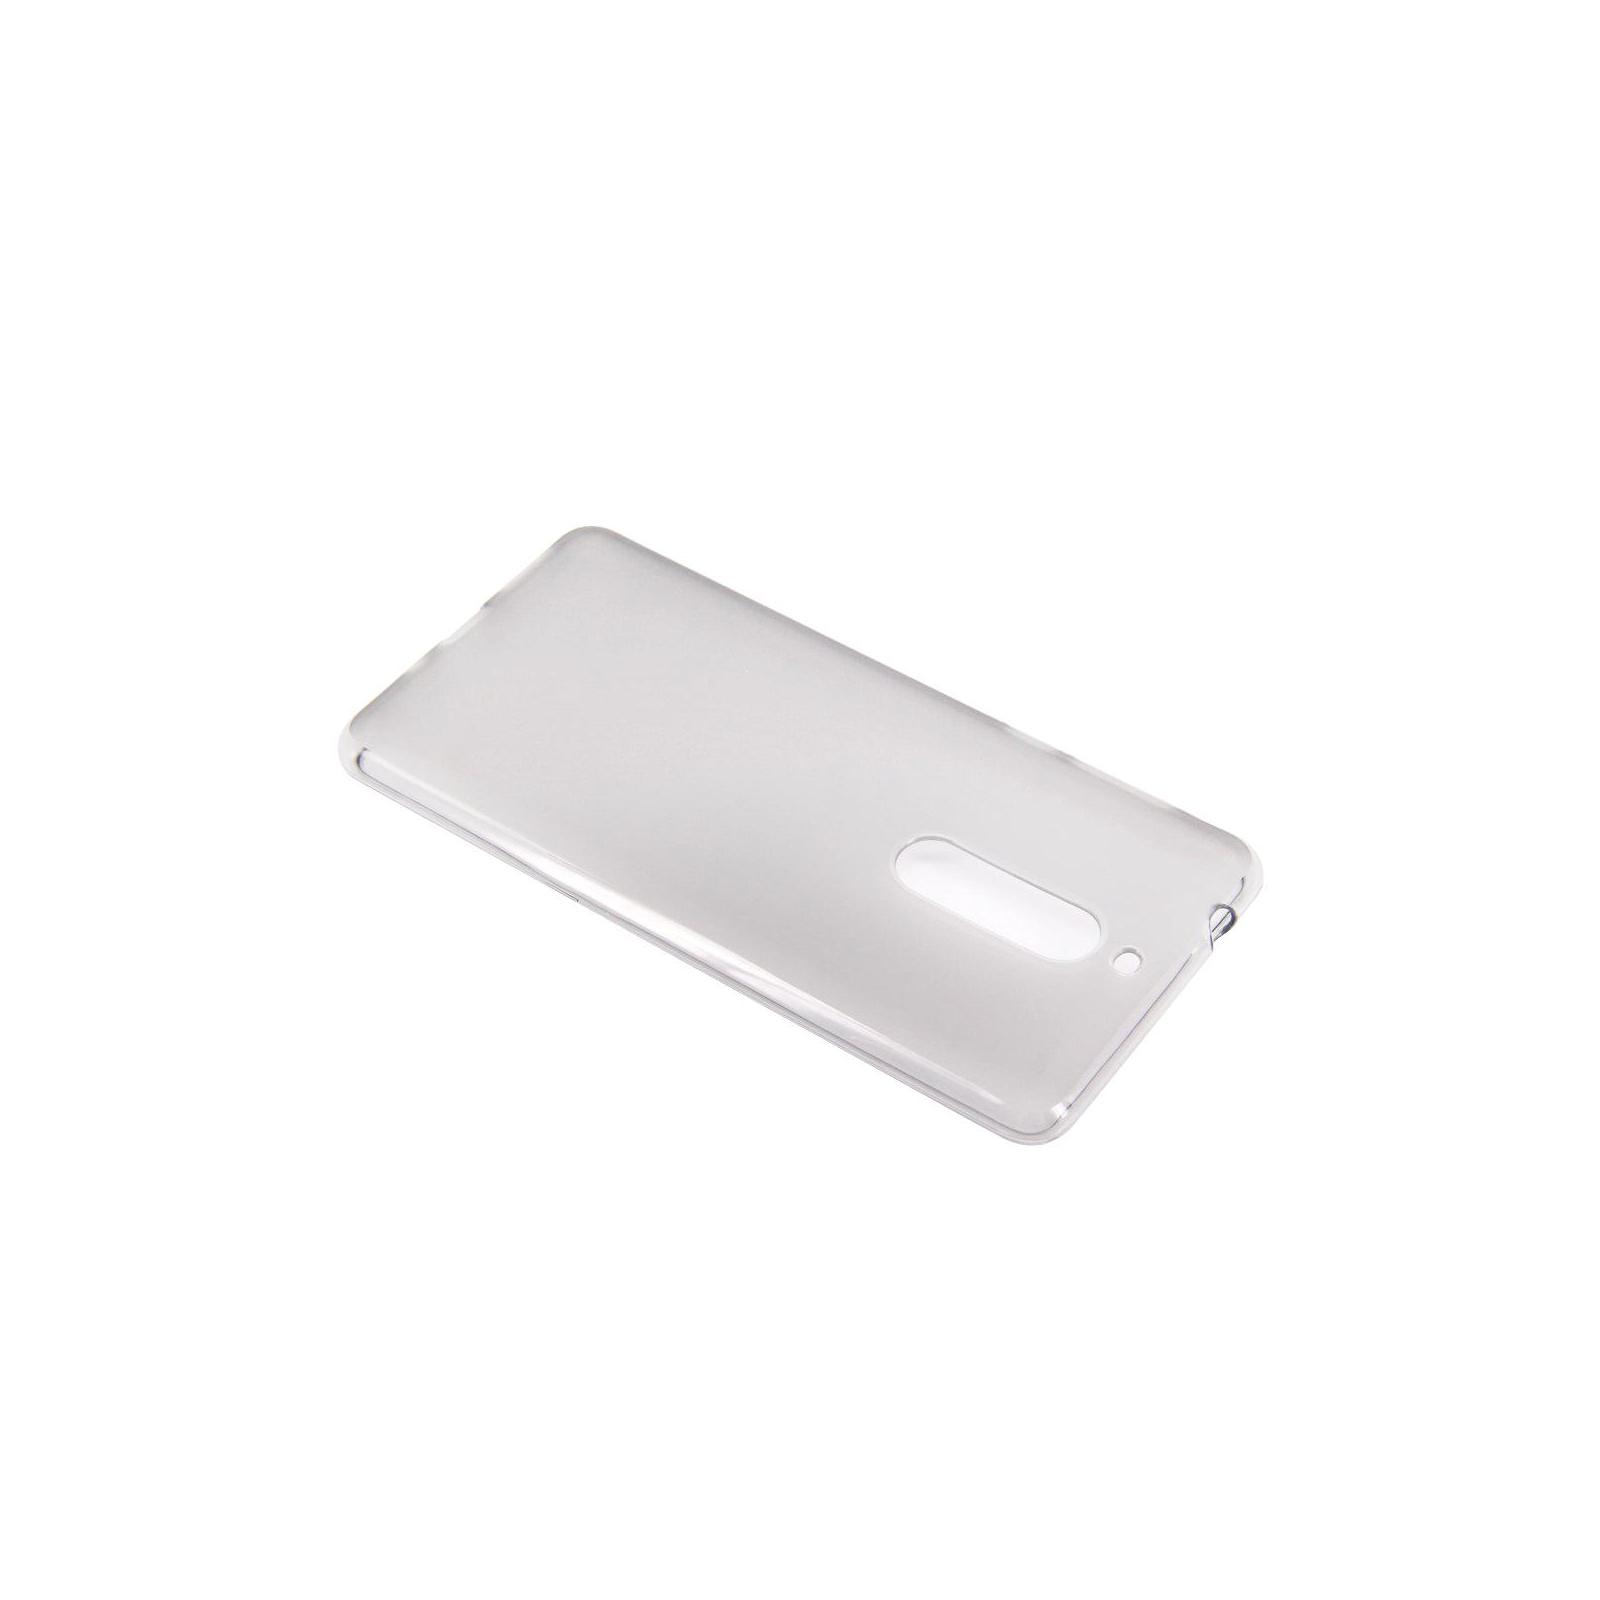 Чехол для моб. телефона SmartCase Nokia 5 TPU Clear (SC-N5) изображение 5